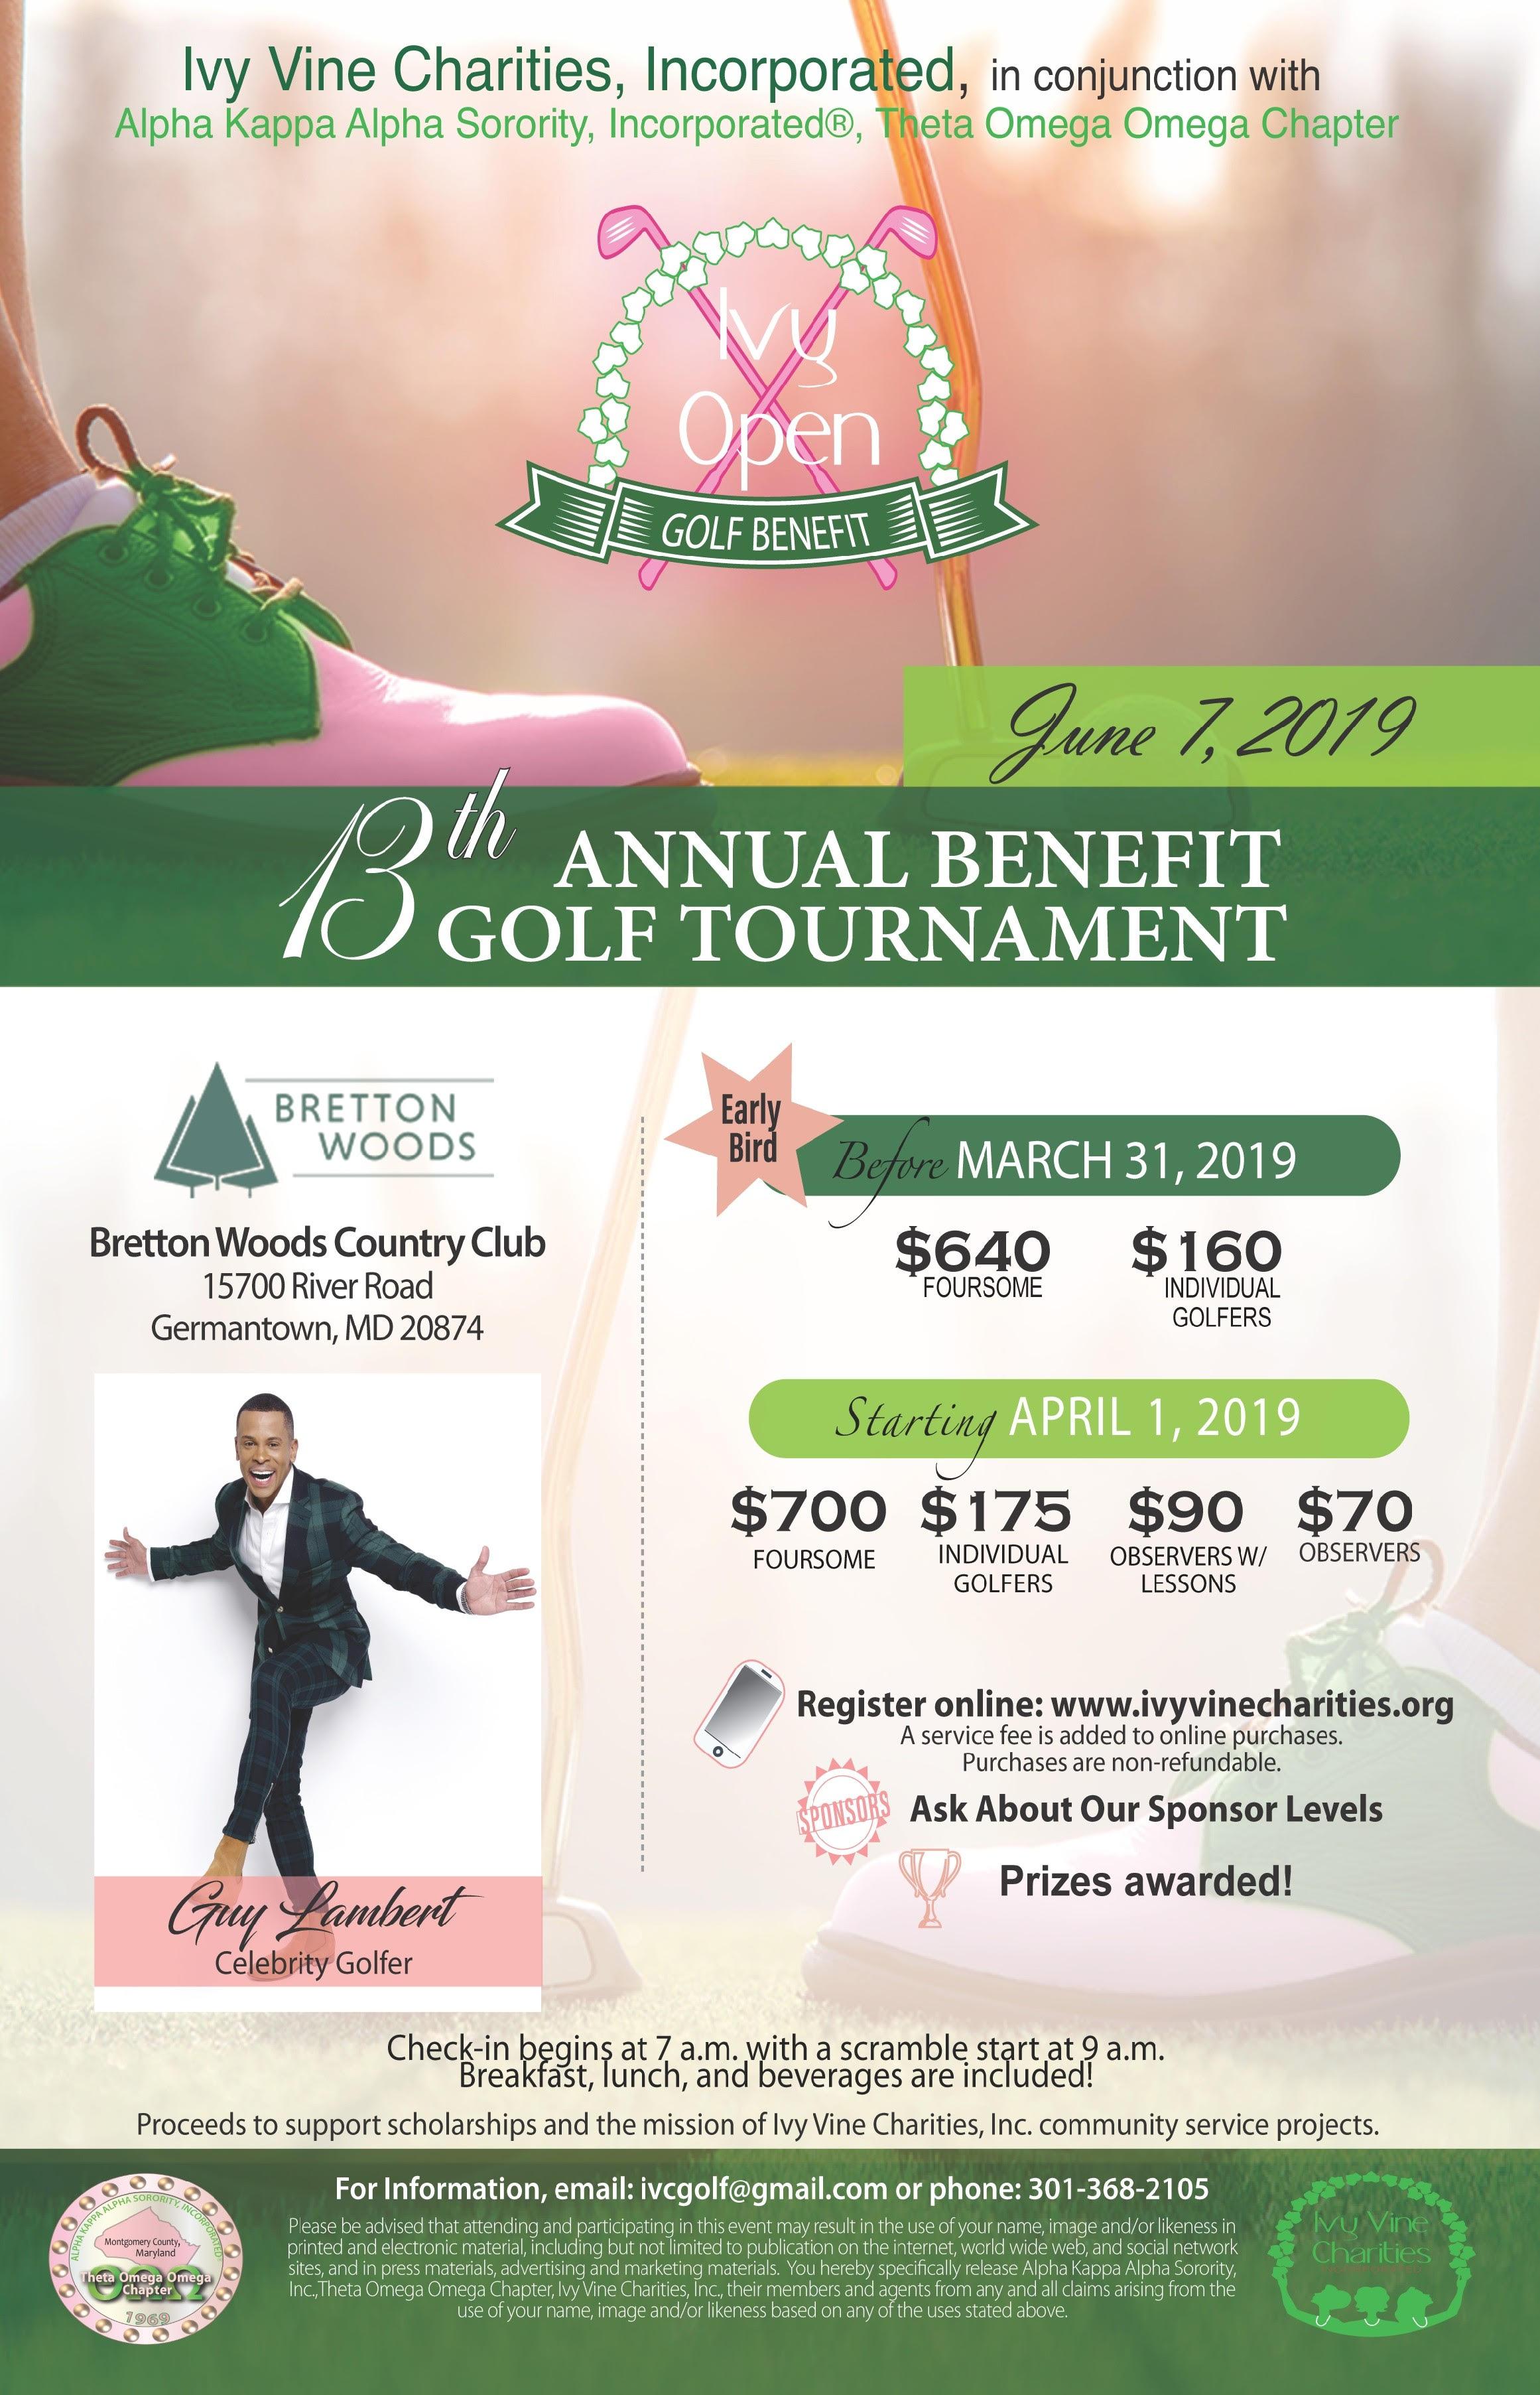 14th Annual Benefit Golf Tournament